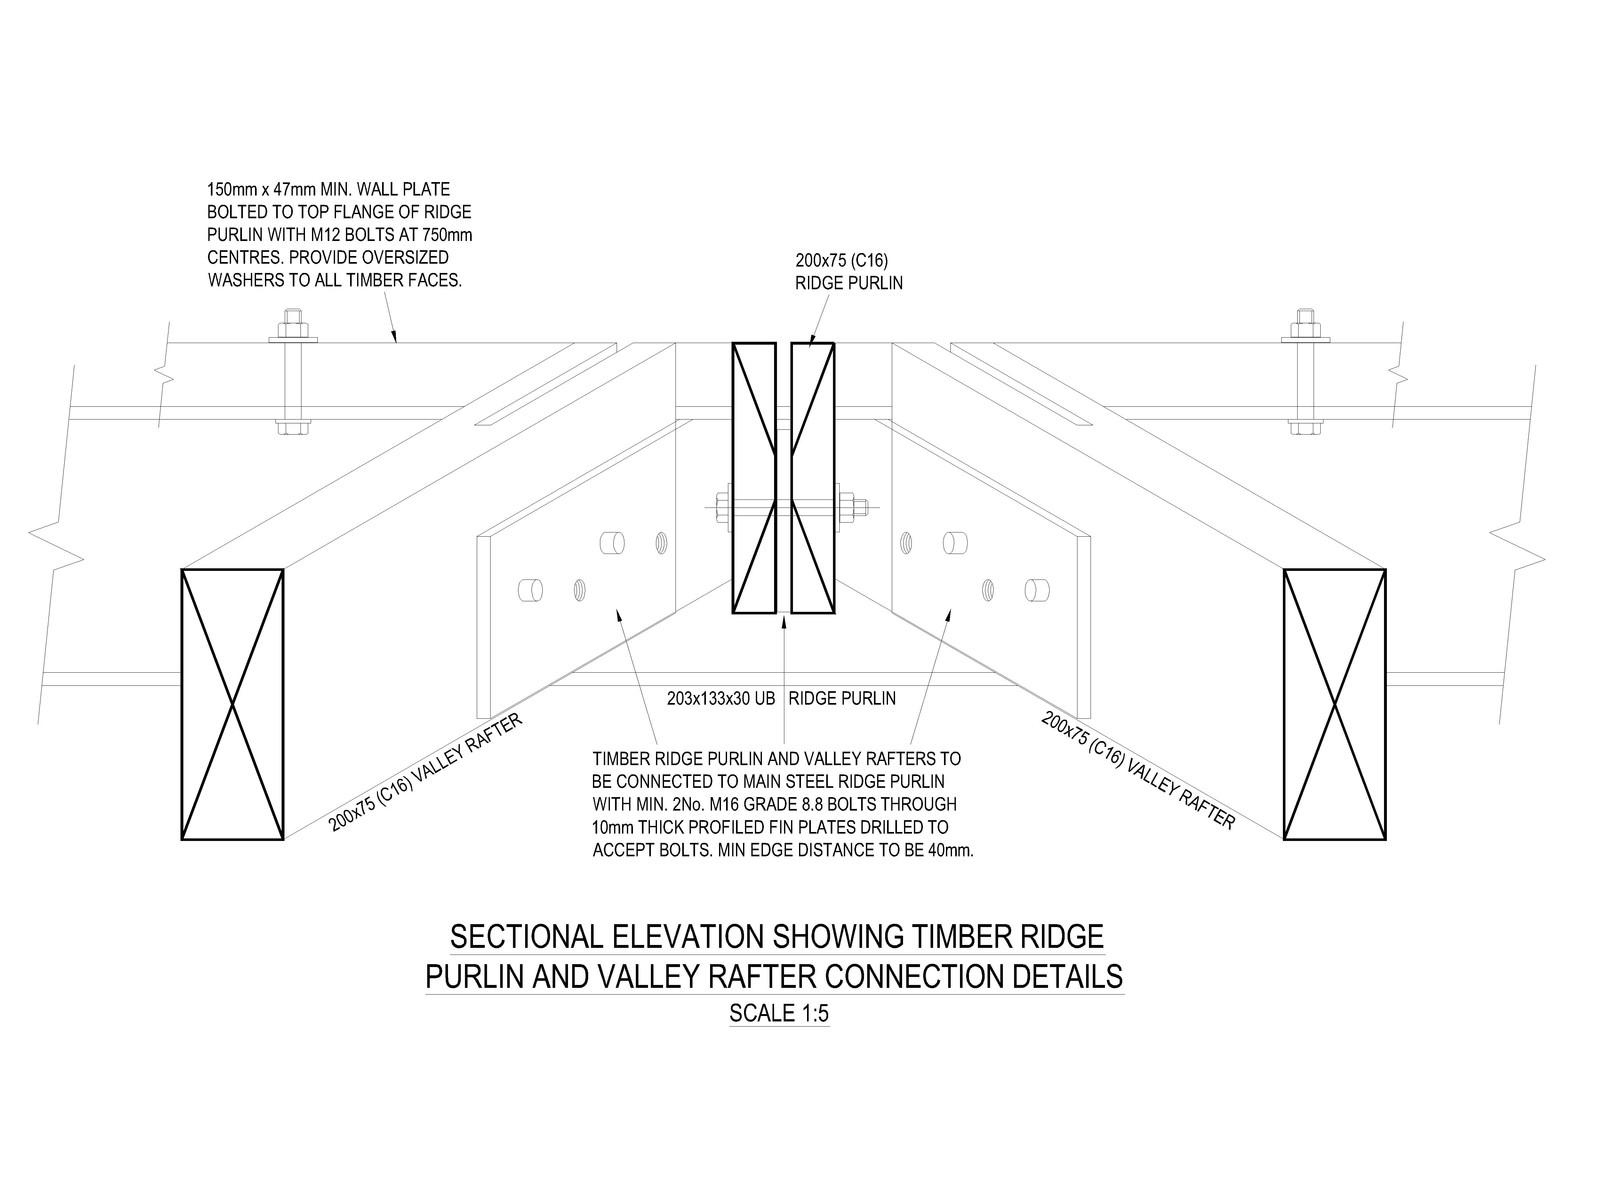 South Crosland New Build - SGM Structural Design